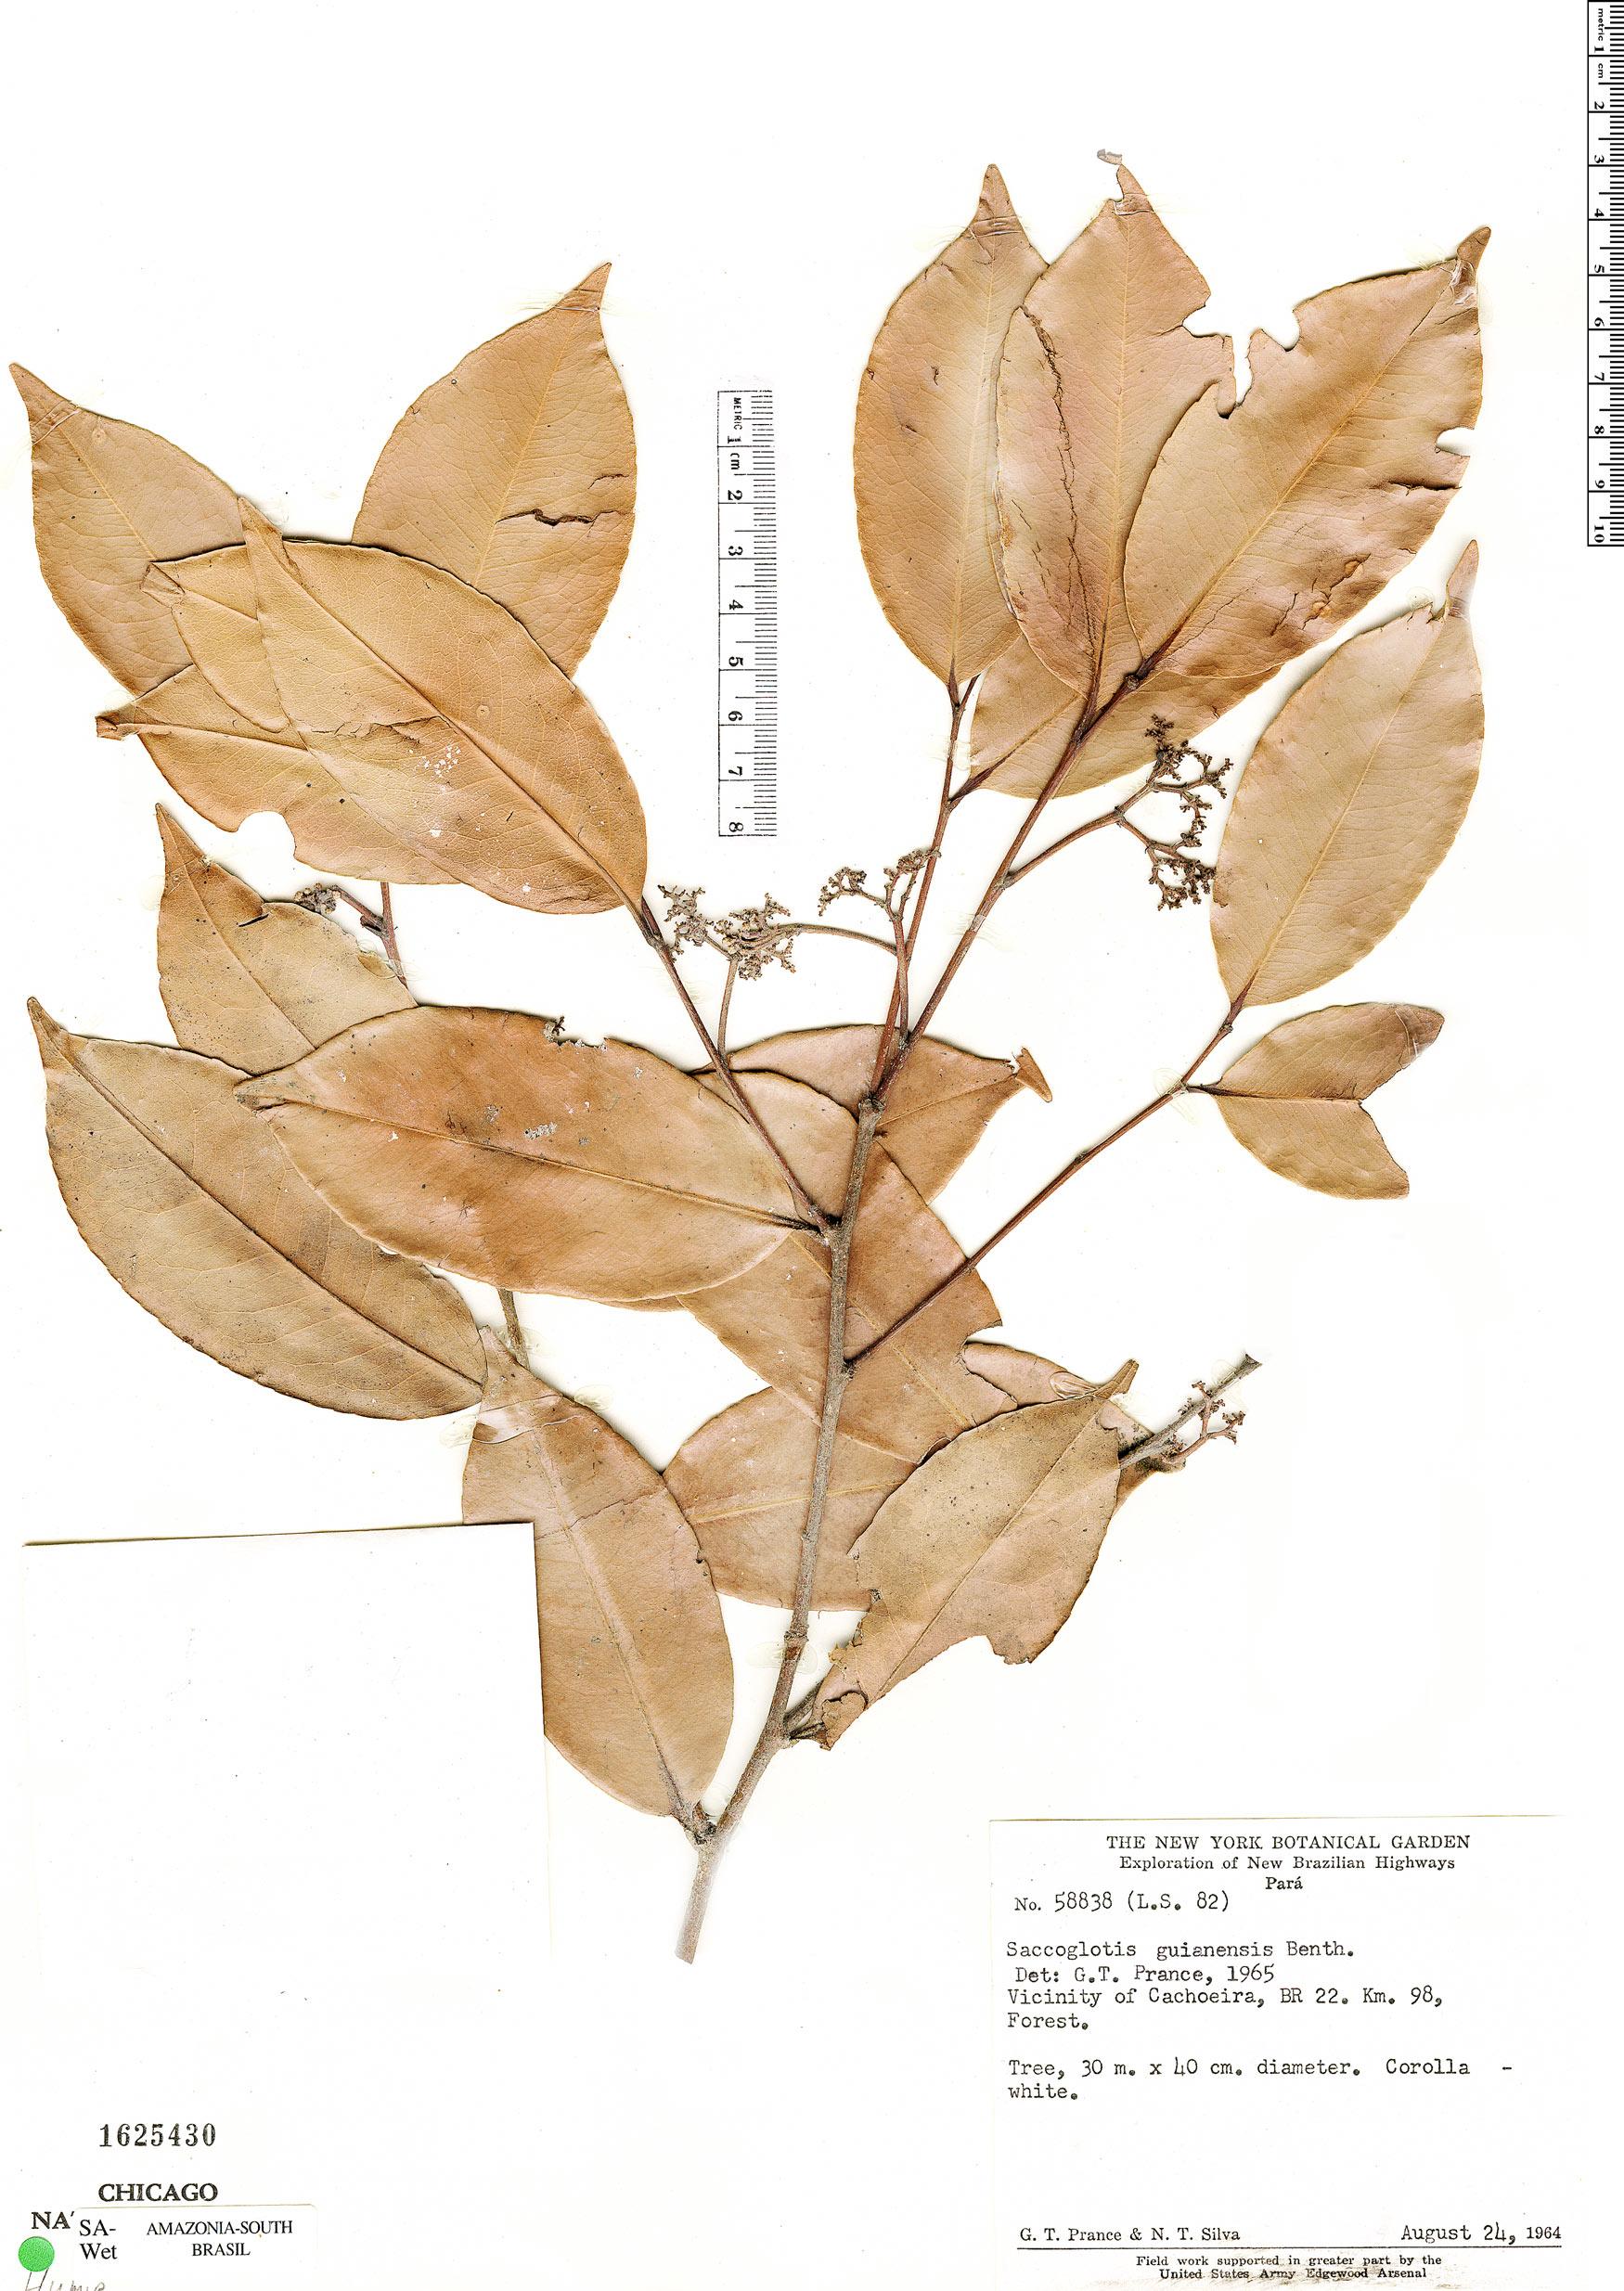 Specimen: Sacoglottis guianensis